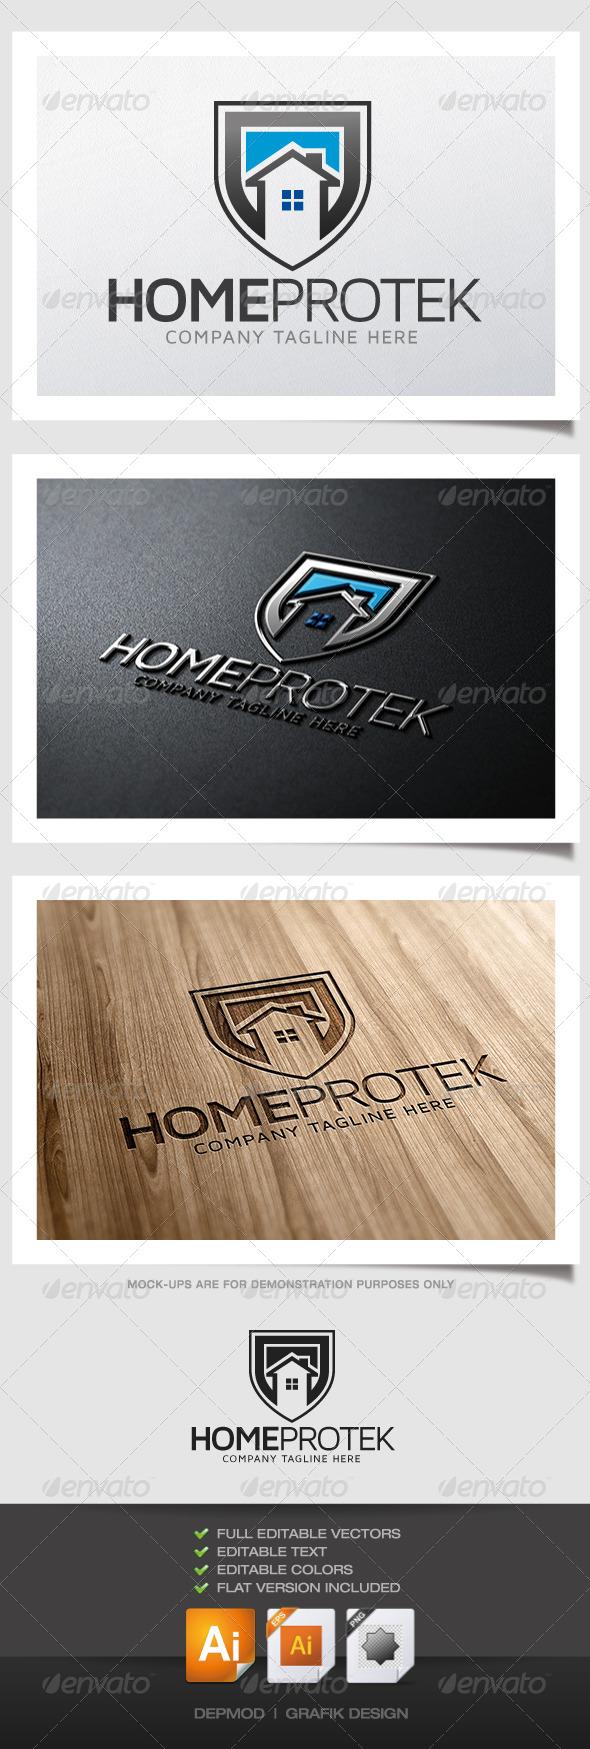 Home Protek Logo - Buildings Logo Templates